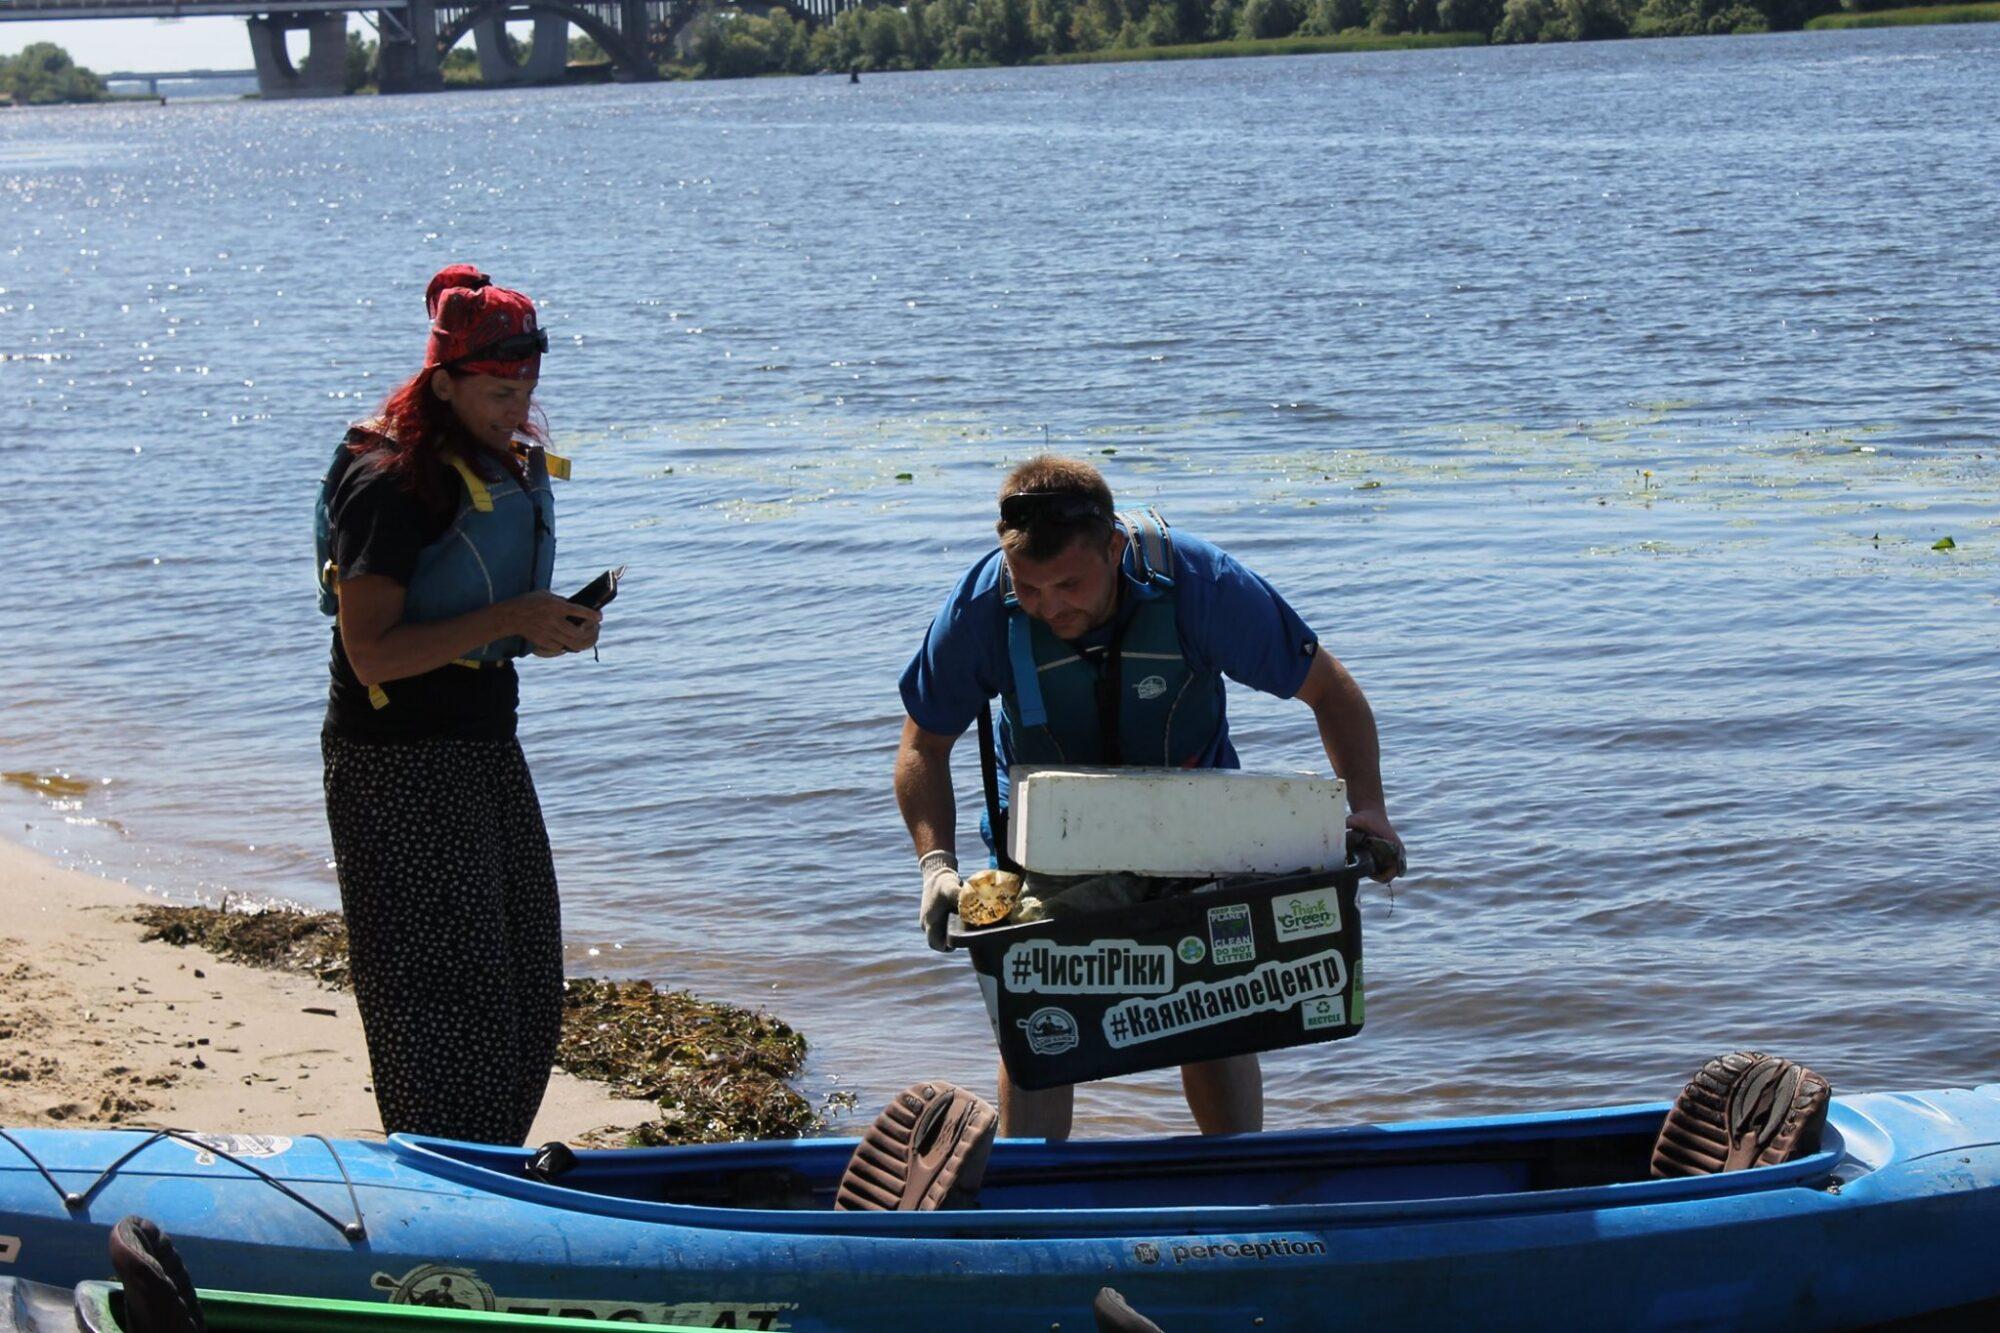 Кияни в акваторії Дніпра збирали сміття на каяках -  - 31 musor3 2000x1333